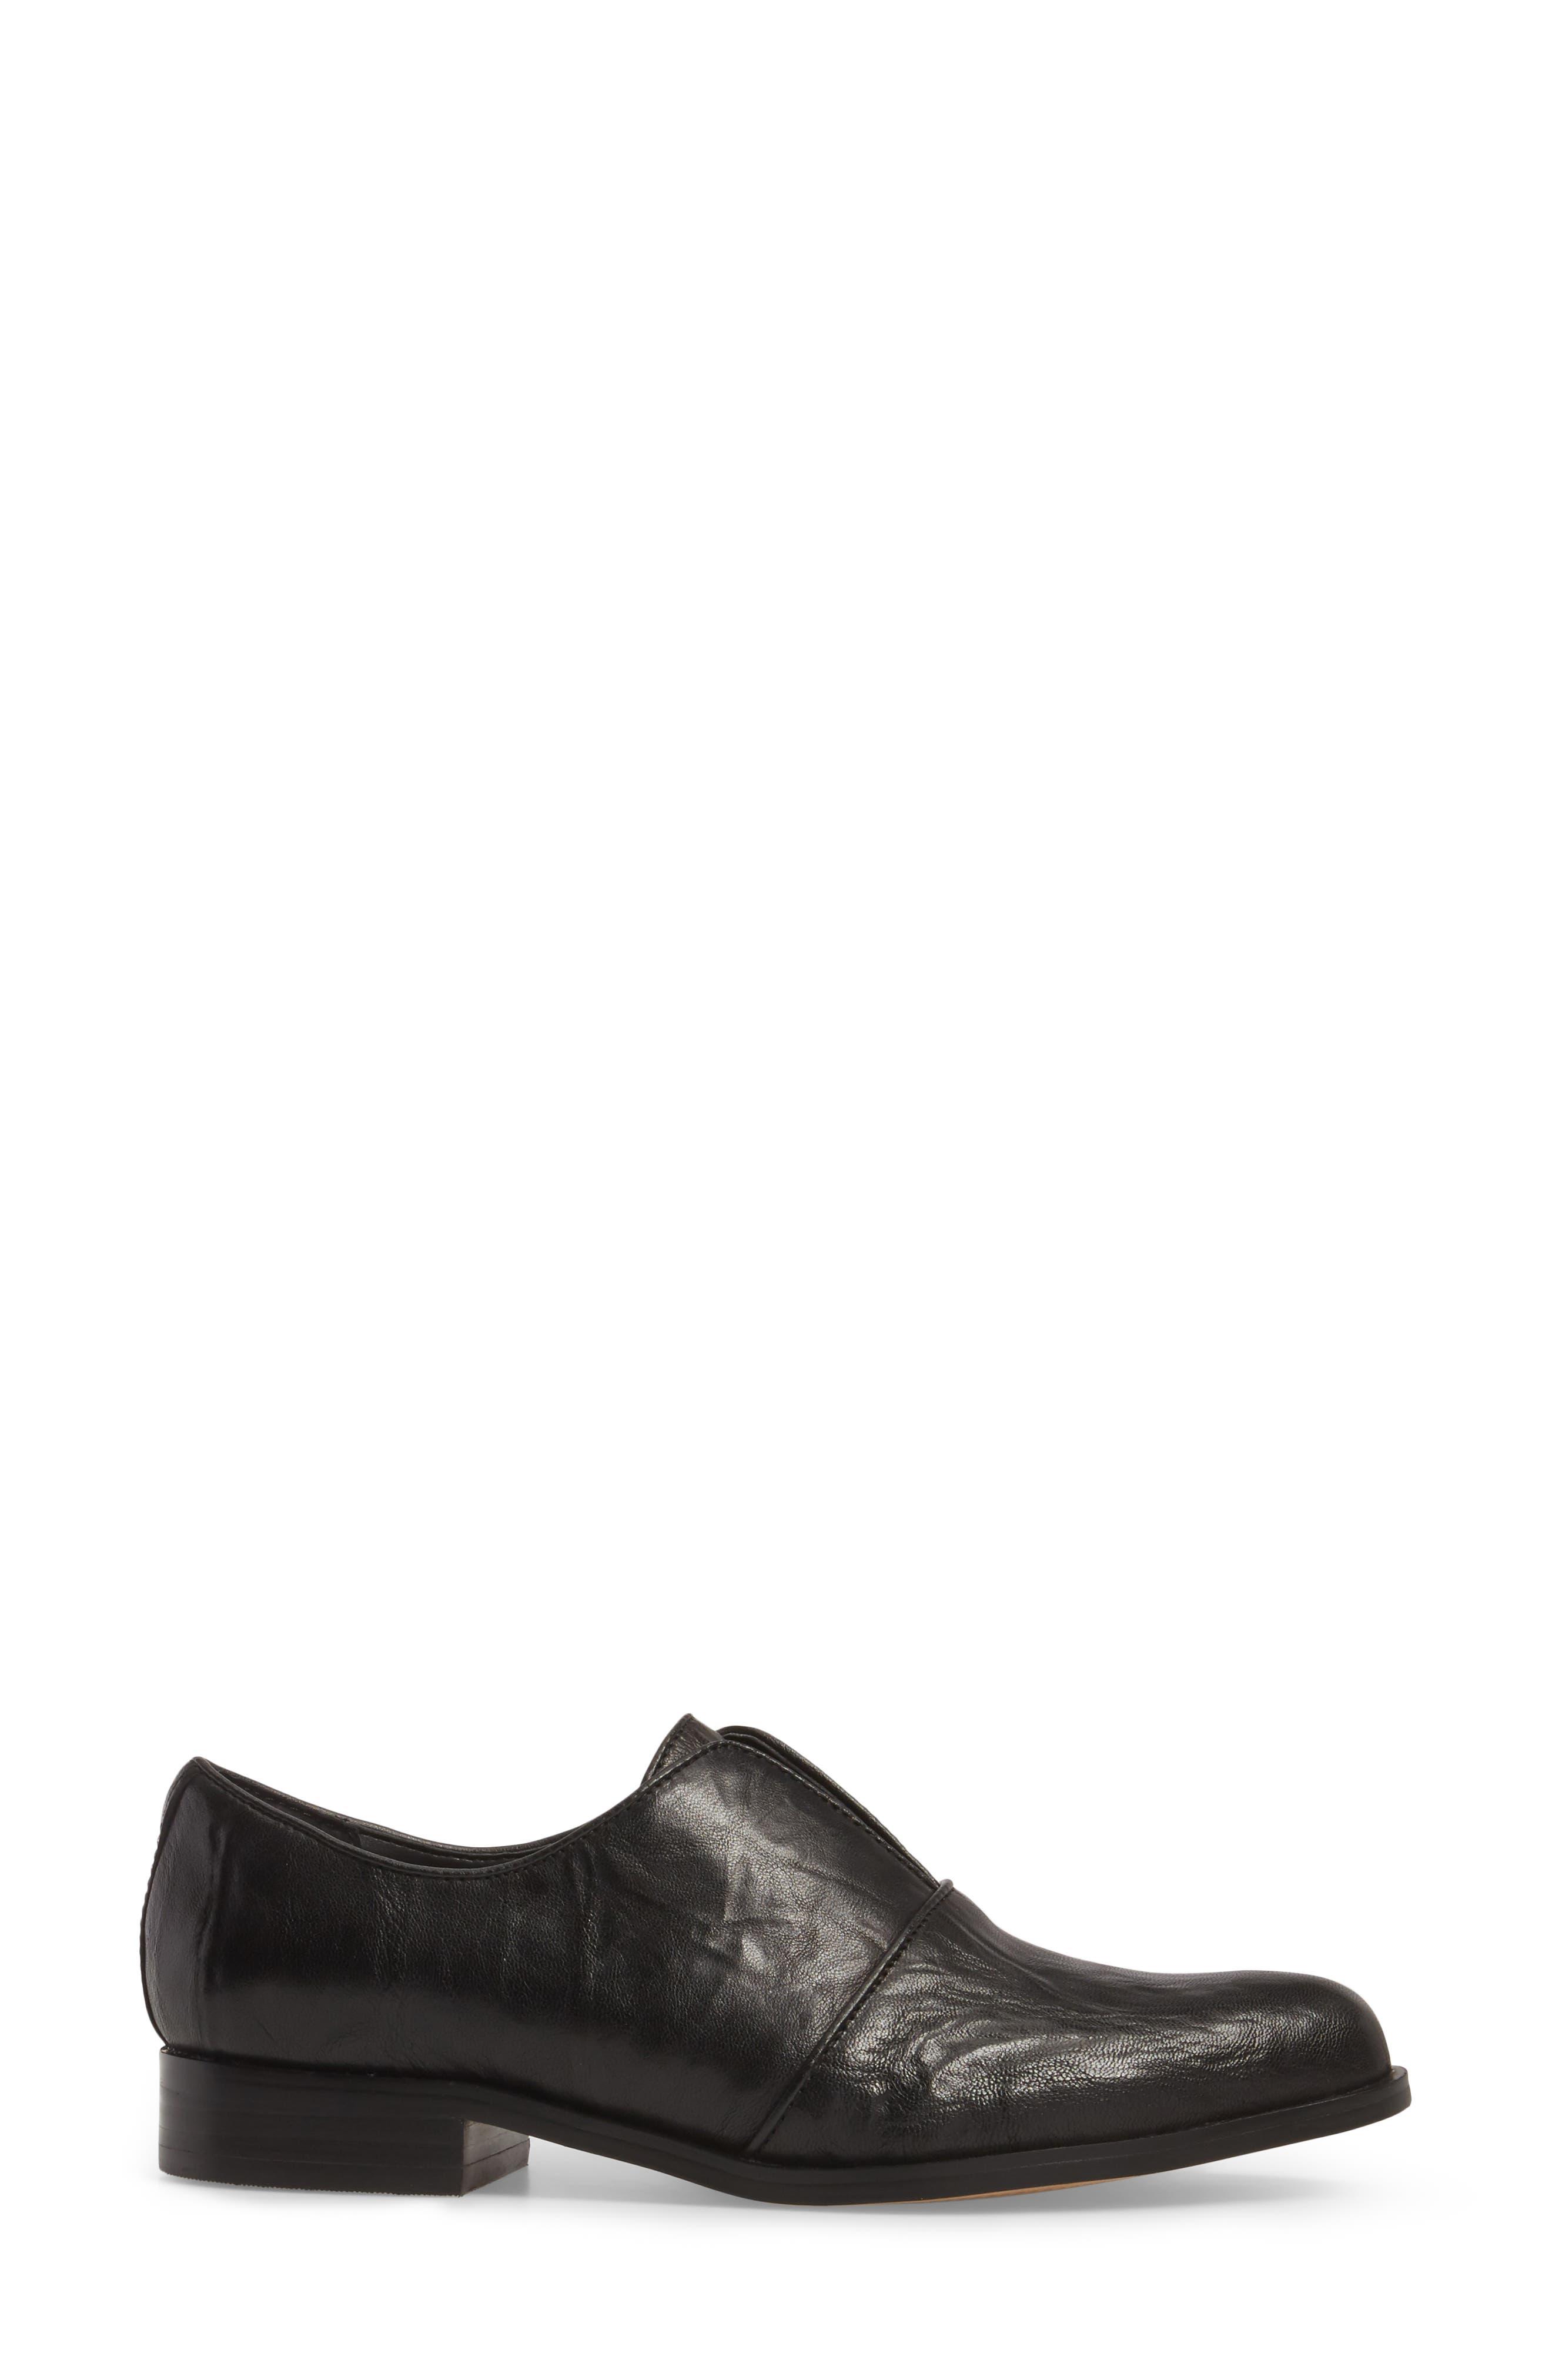 Isola Maria Slip-On Oxford,                             Alternate thumbnail 3, color,                             Black Leather